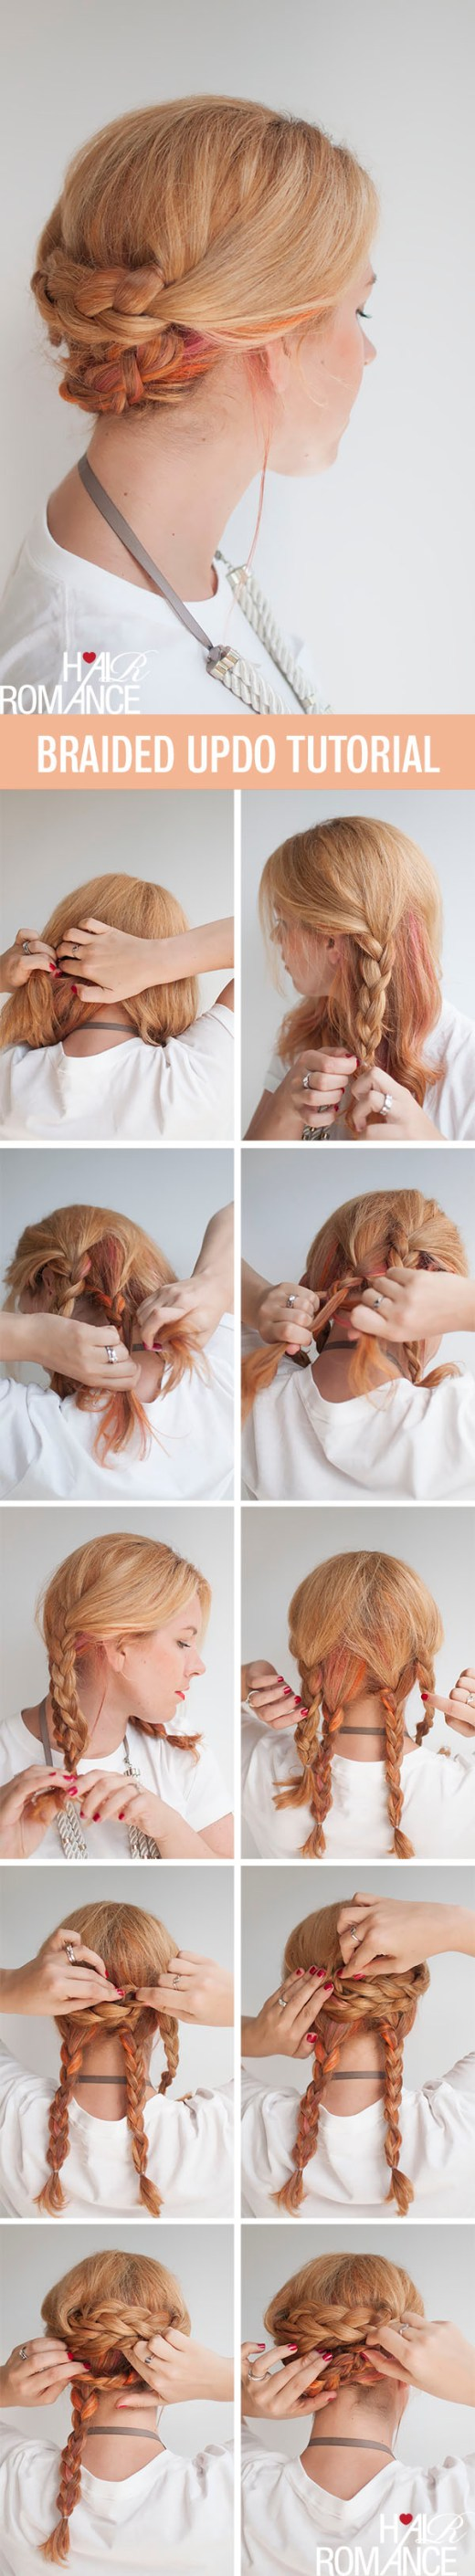 Braid Hair Tutorials: 12 Ways to Braid Your Hair - Hairstyles Weekly